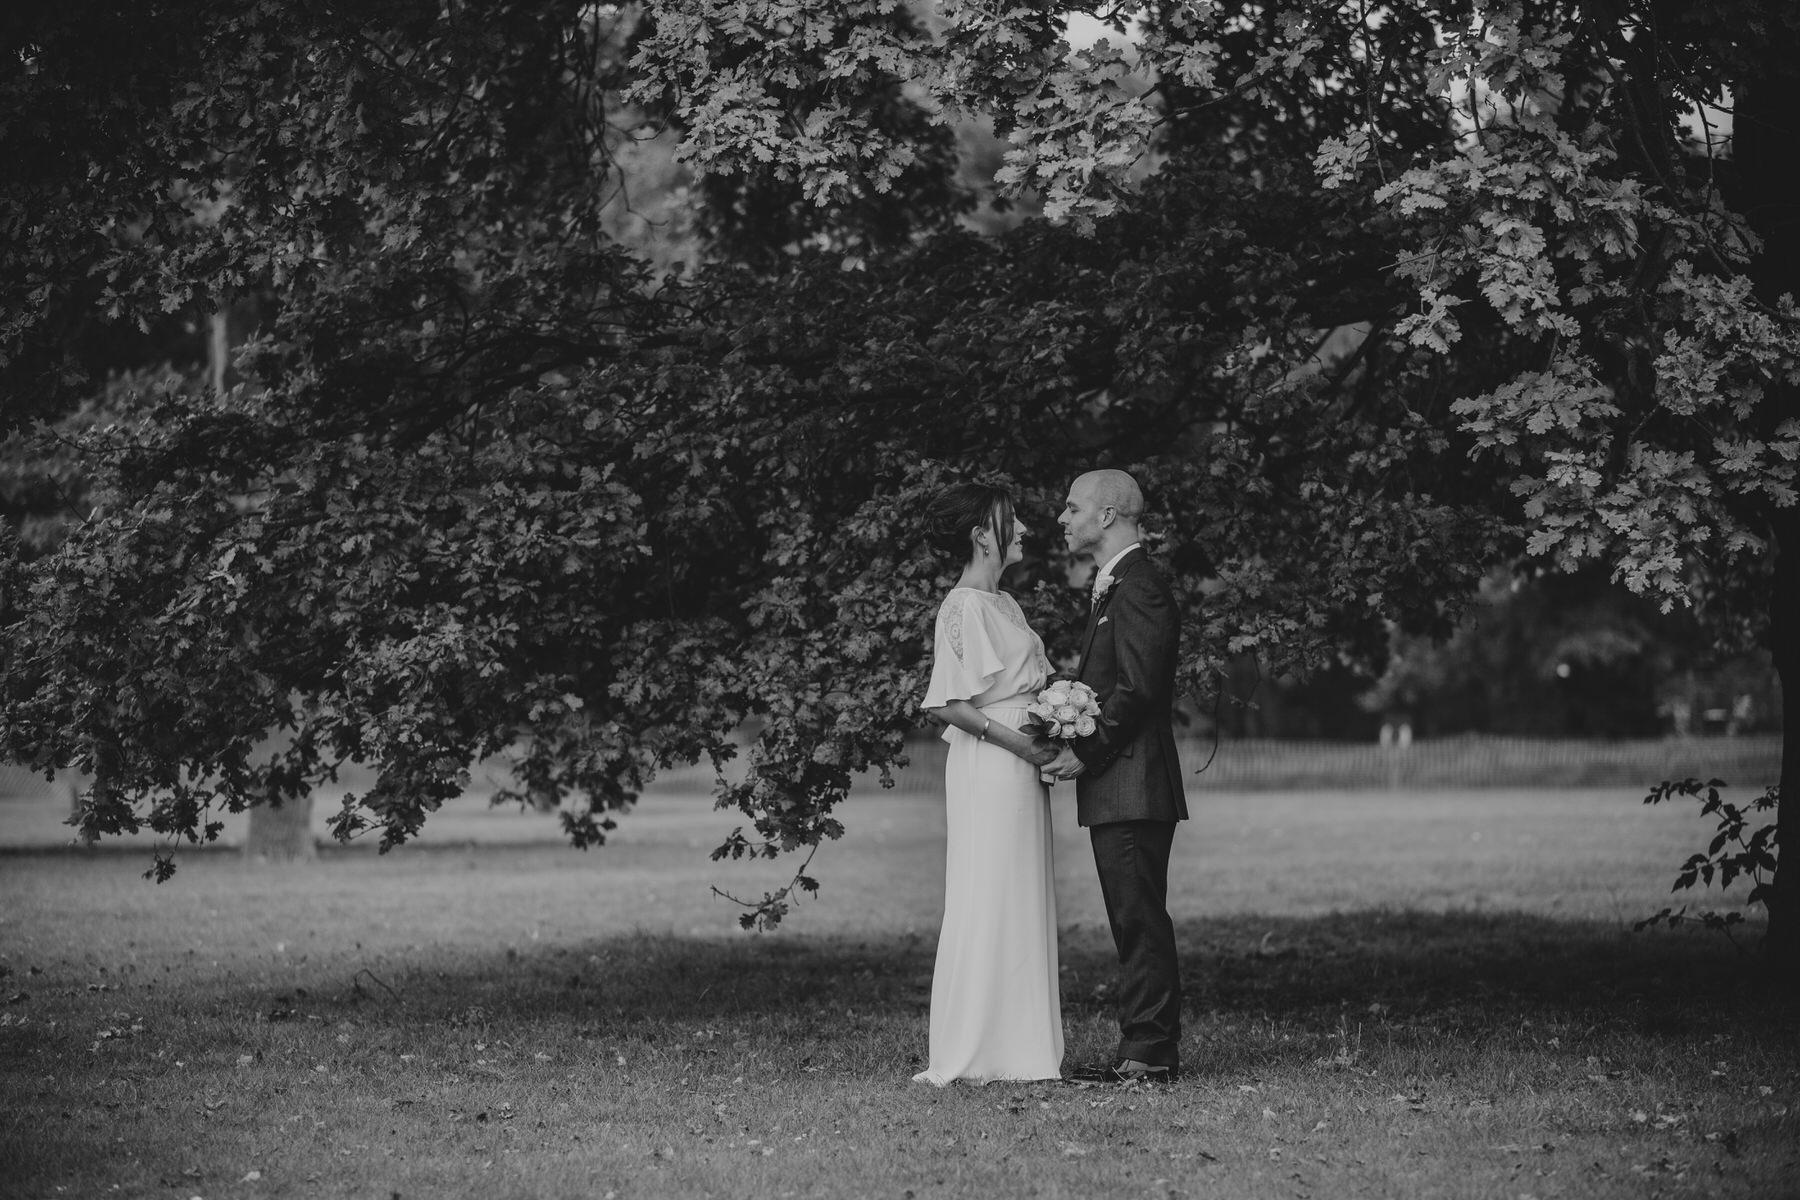 167 BW Belair Park bridal photo under tree.jpg